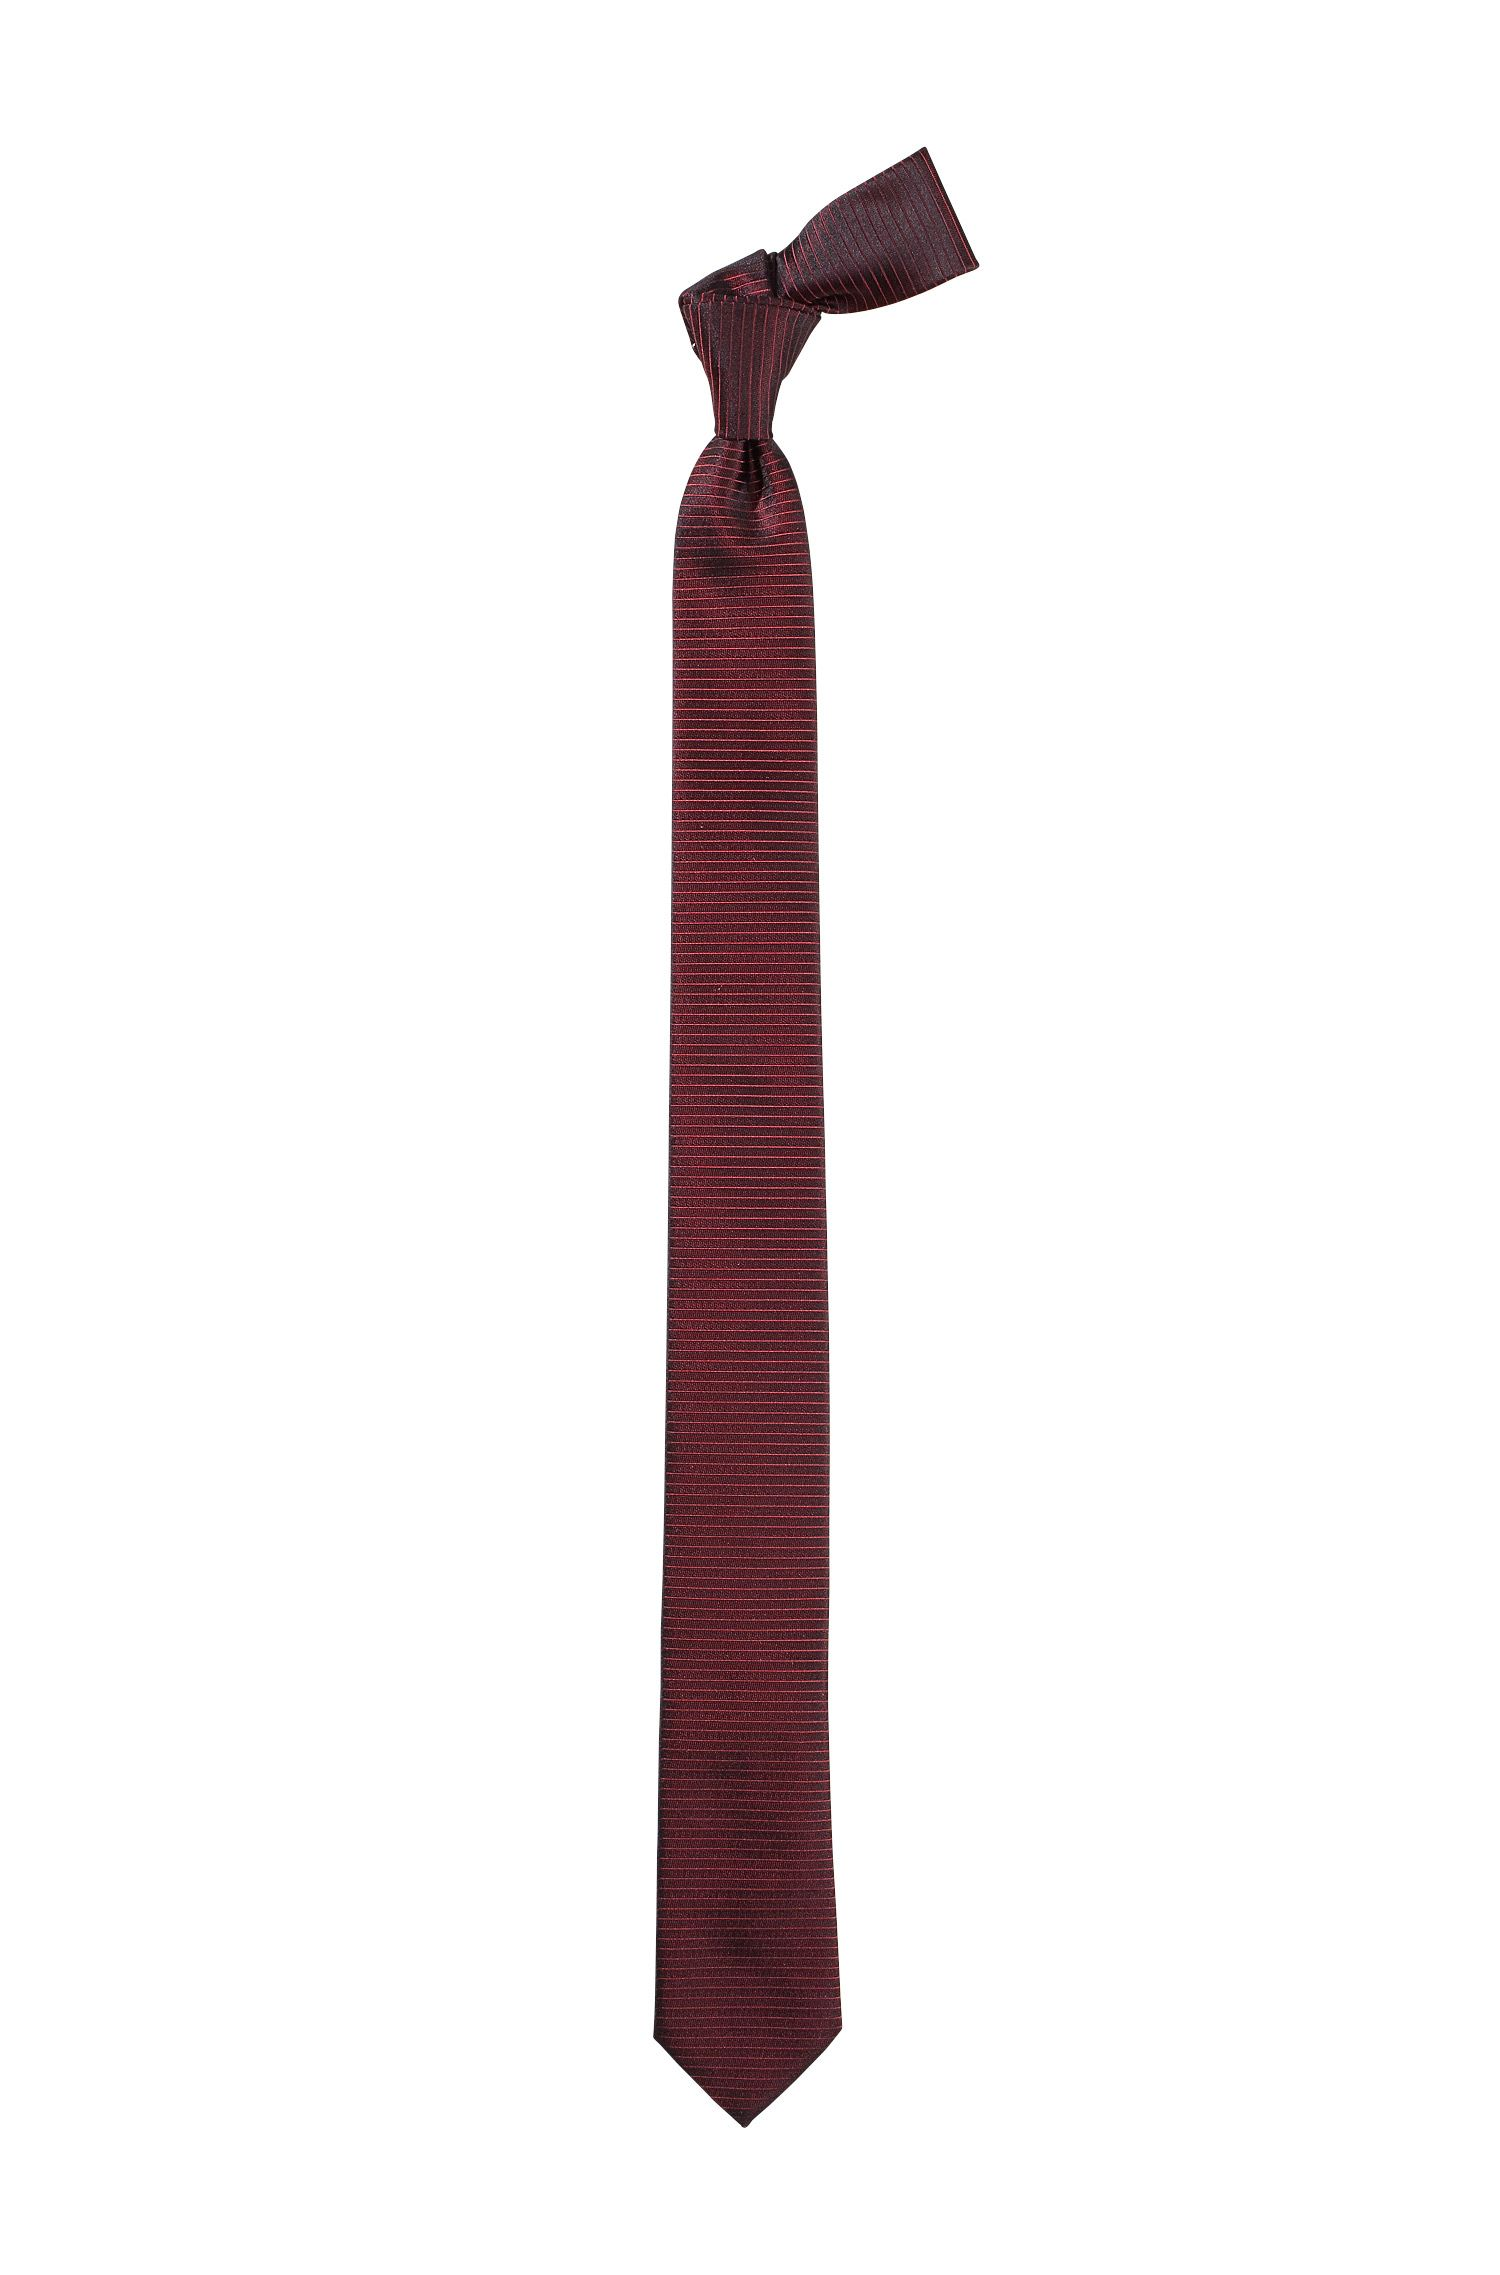 Cravate en soie, TIE CM 4,5